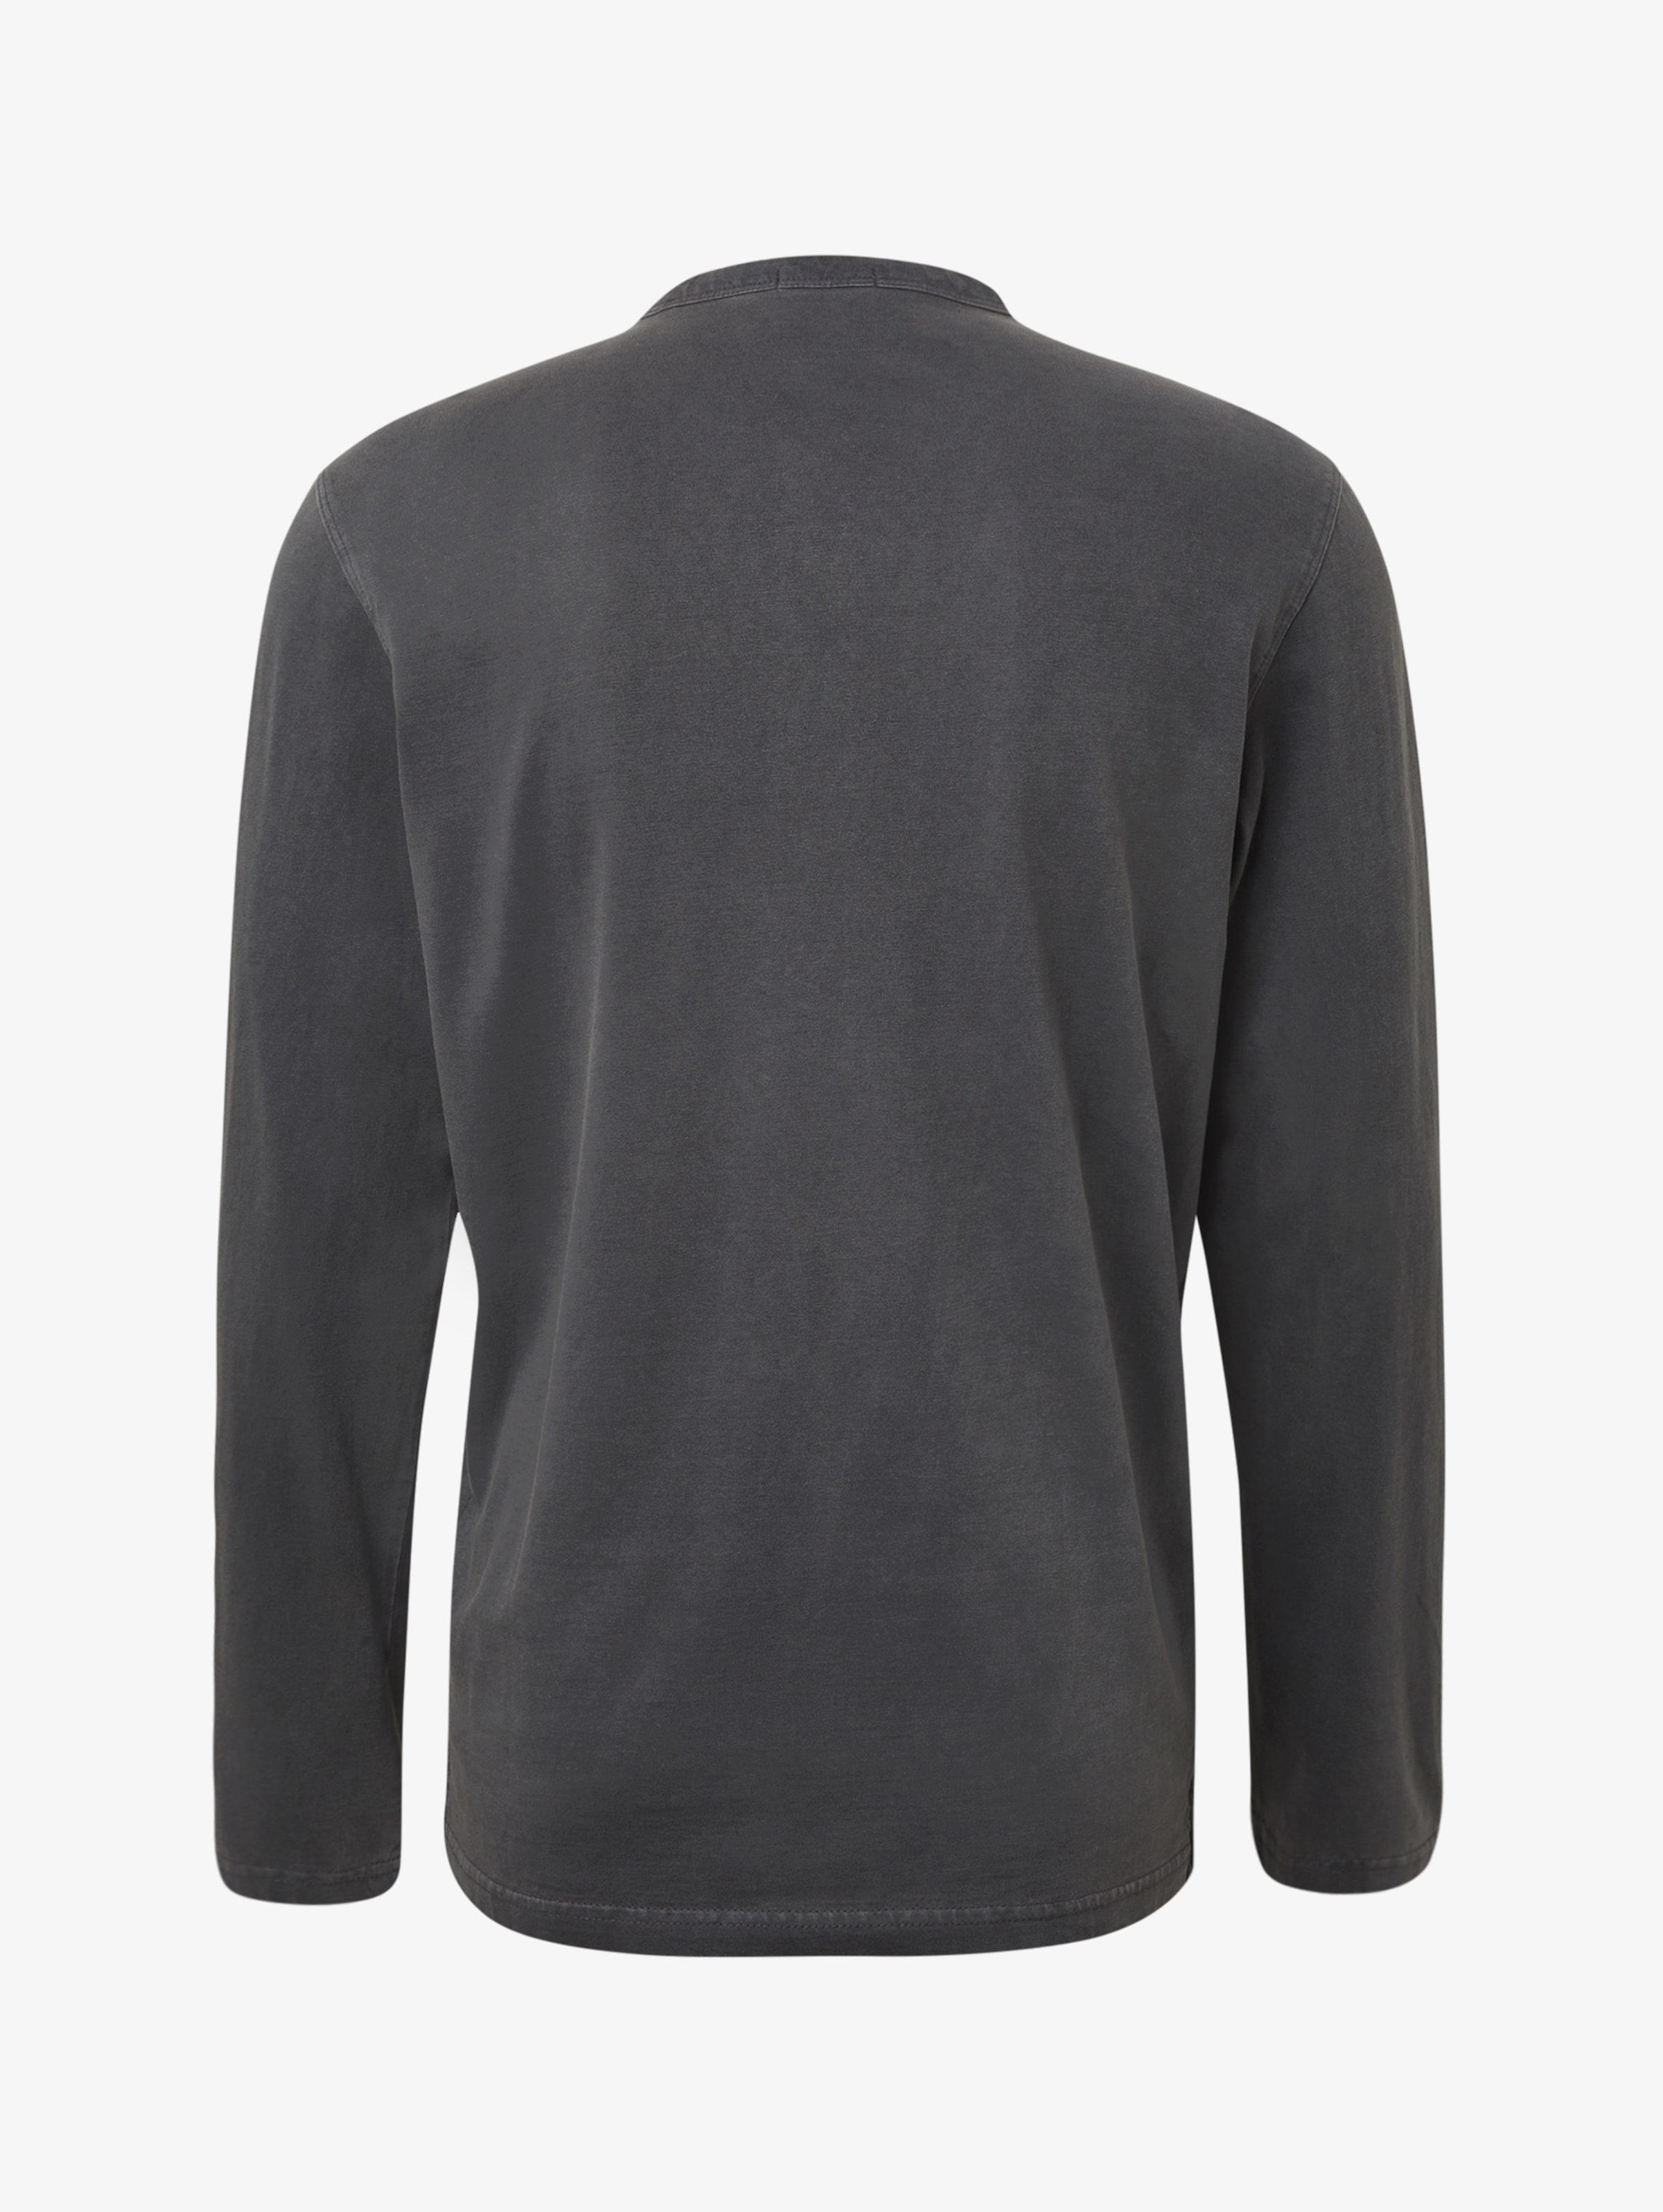 Tom shirt Dunkelgrau T In Tailor QshrCotxBd